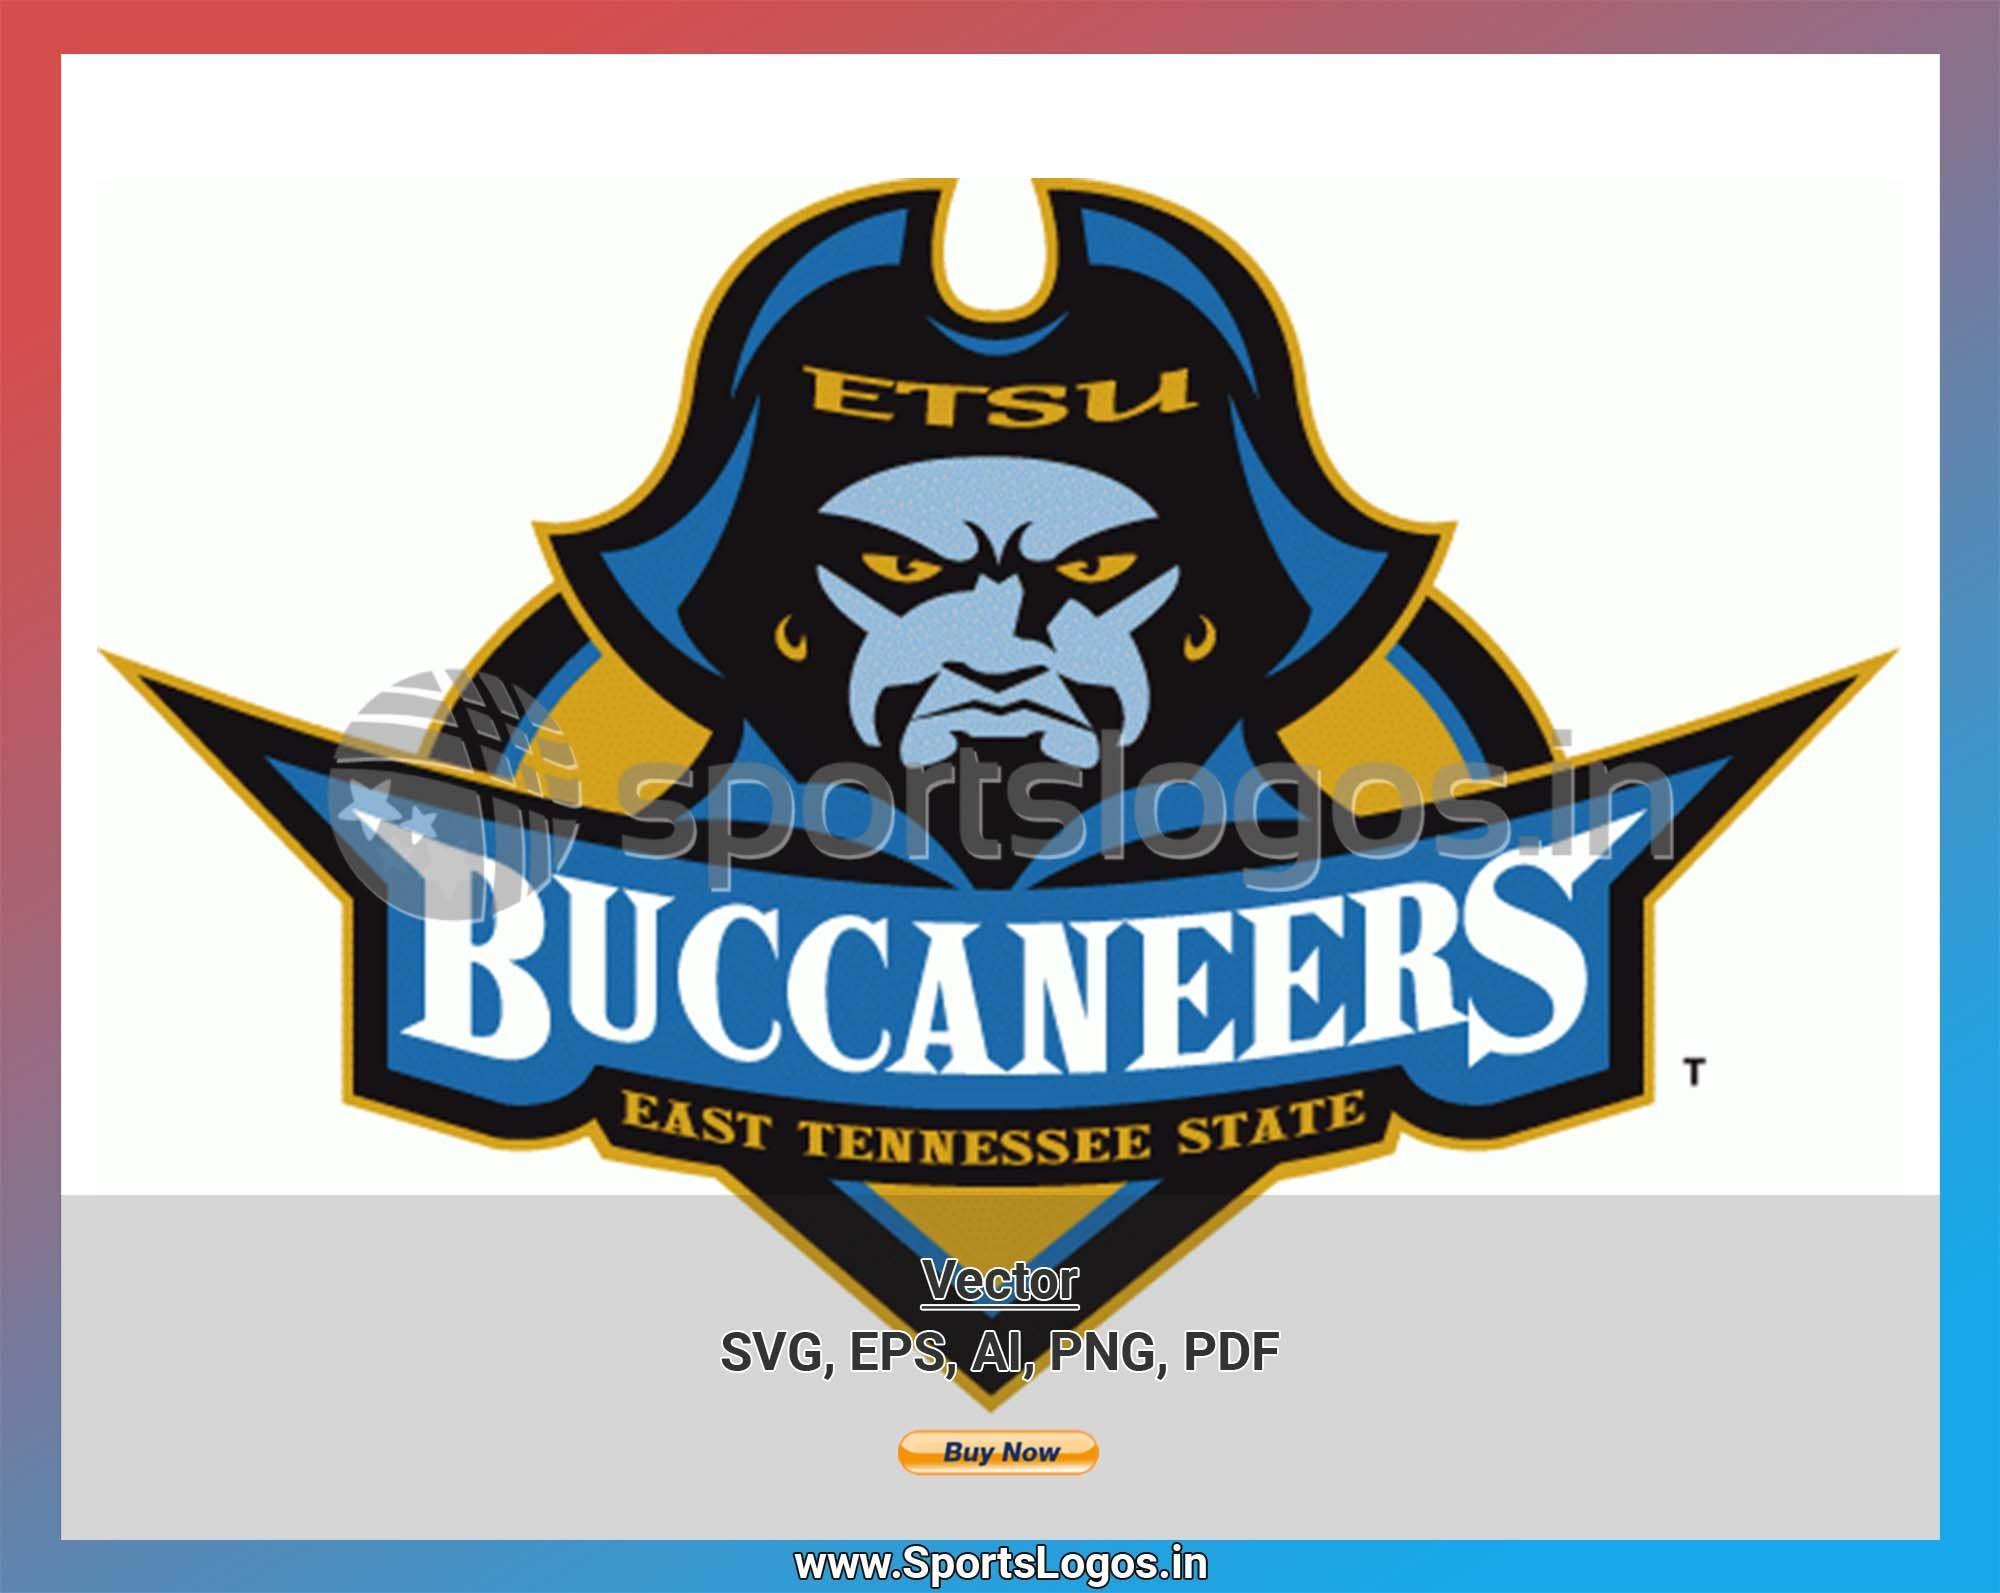 ETSU Buccaneers 20022006, NCAA Division I (dh